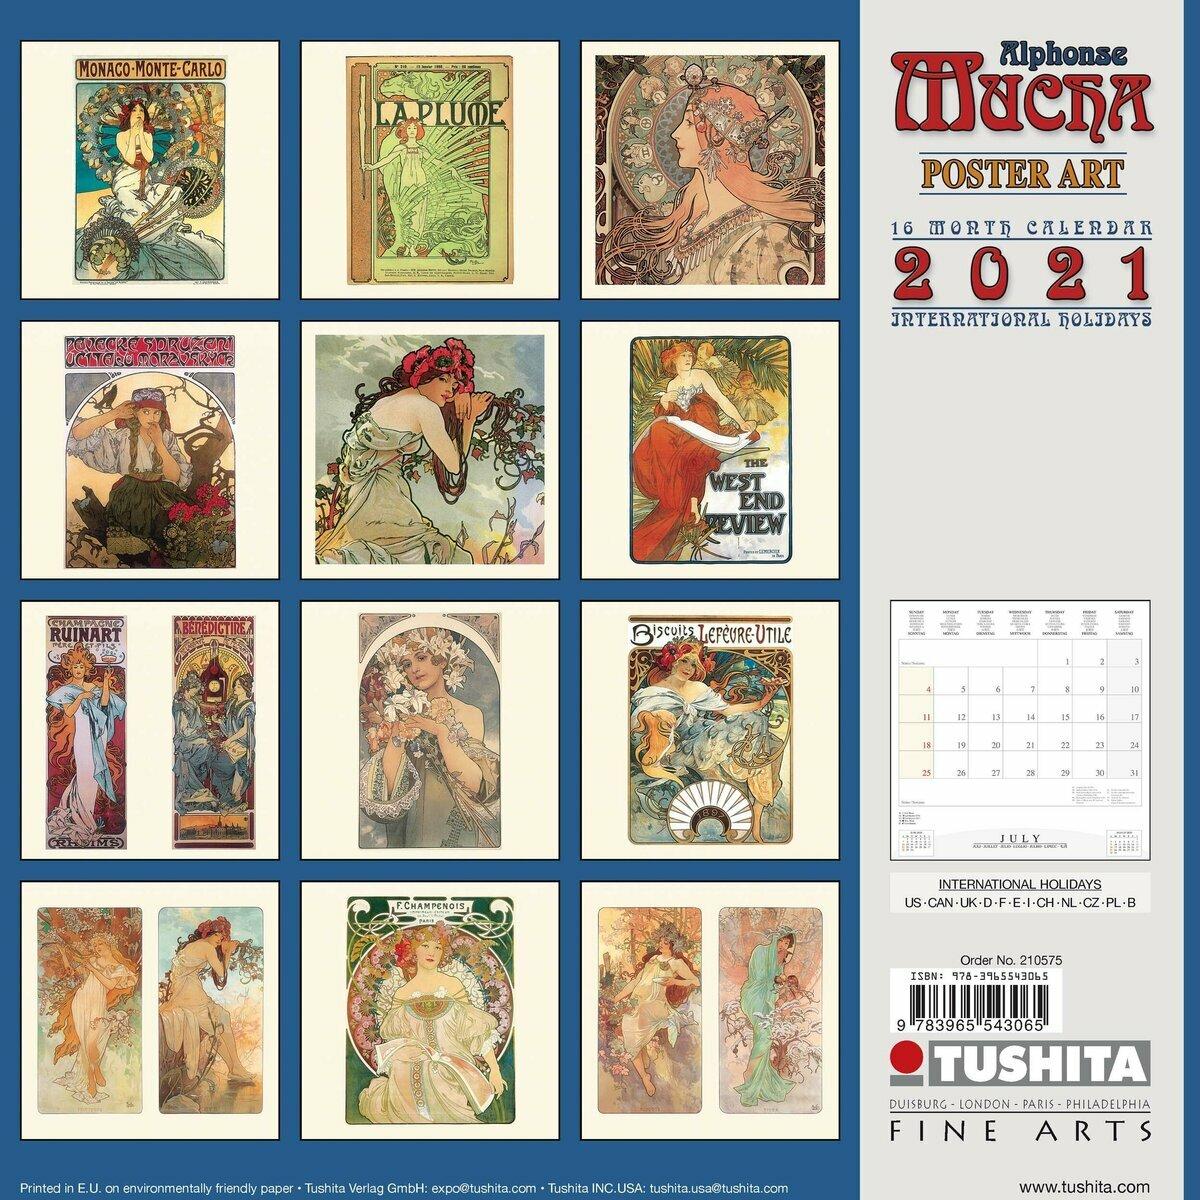 Calendrier 2021 Alphonse Mucha affiche publicitaire